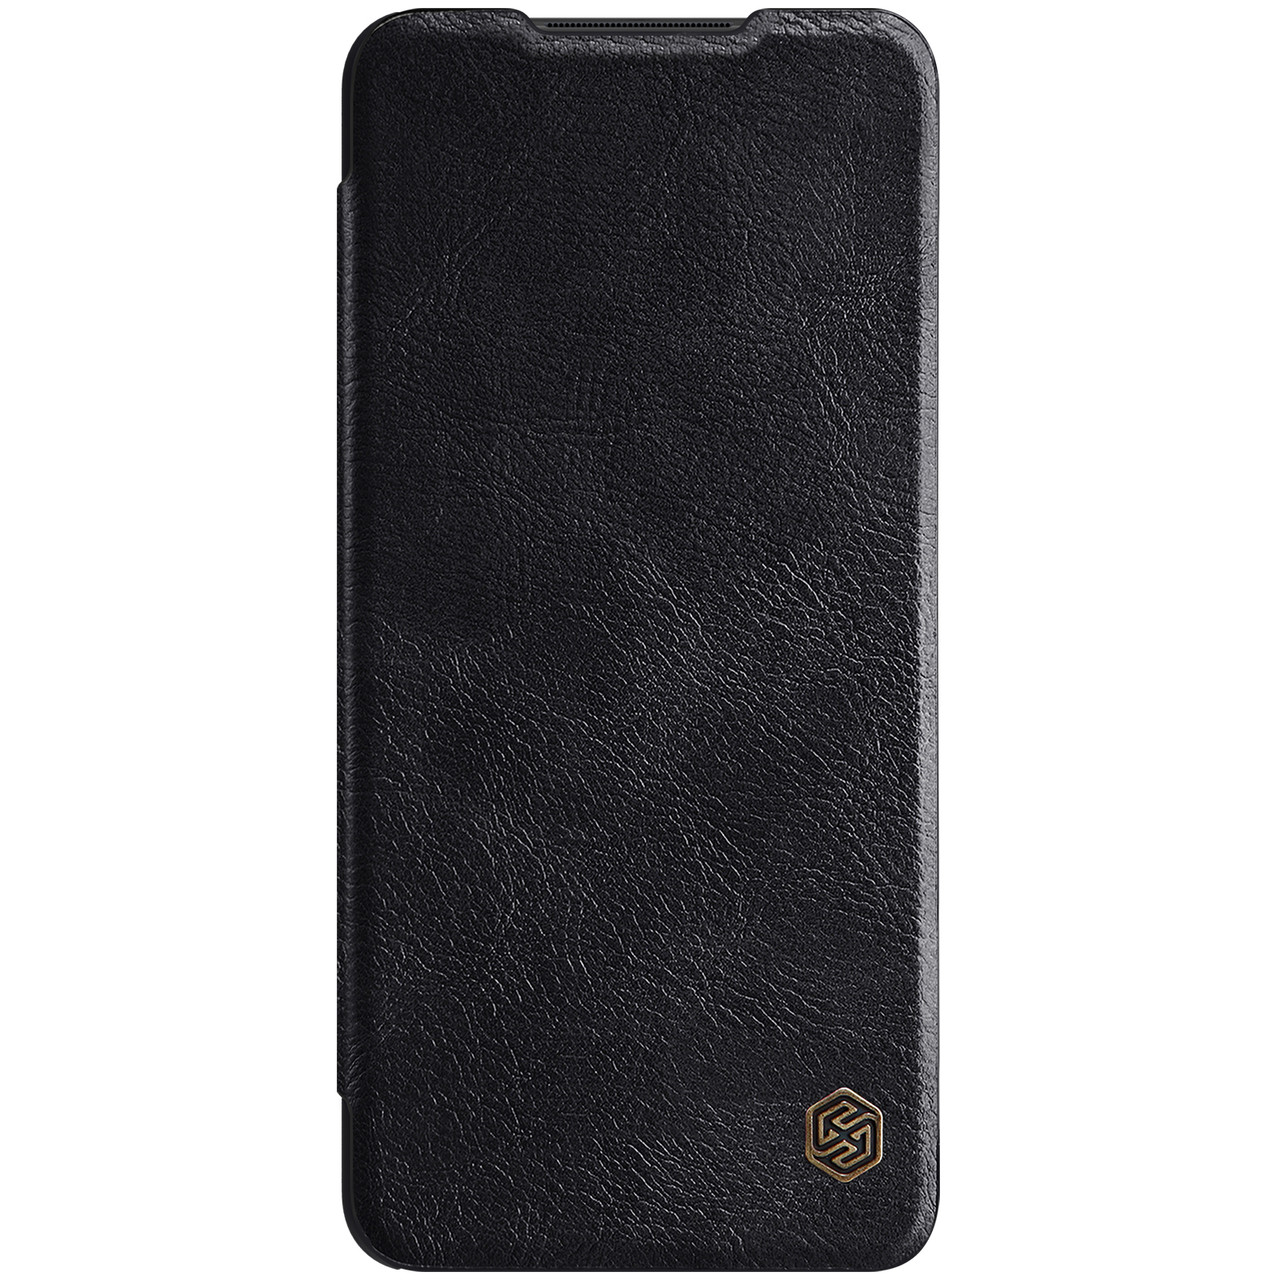 Захисний чохол-книжка Nillkin для Samsung Galaxy A12 (Qin leather case) Black Чорний